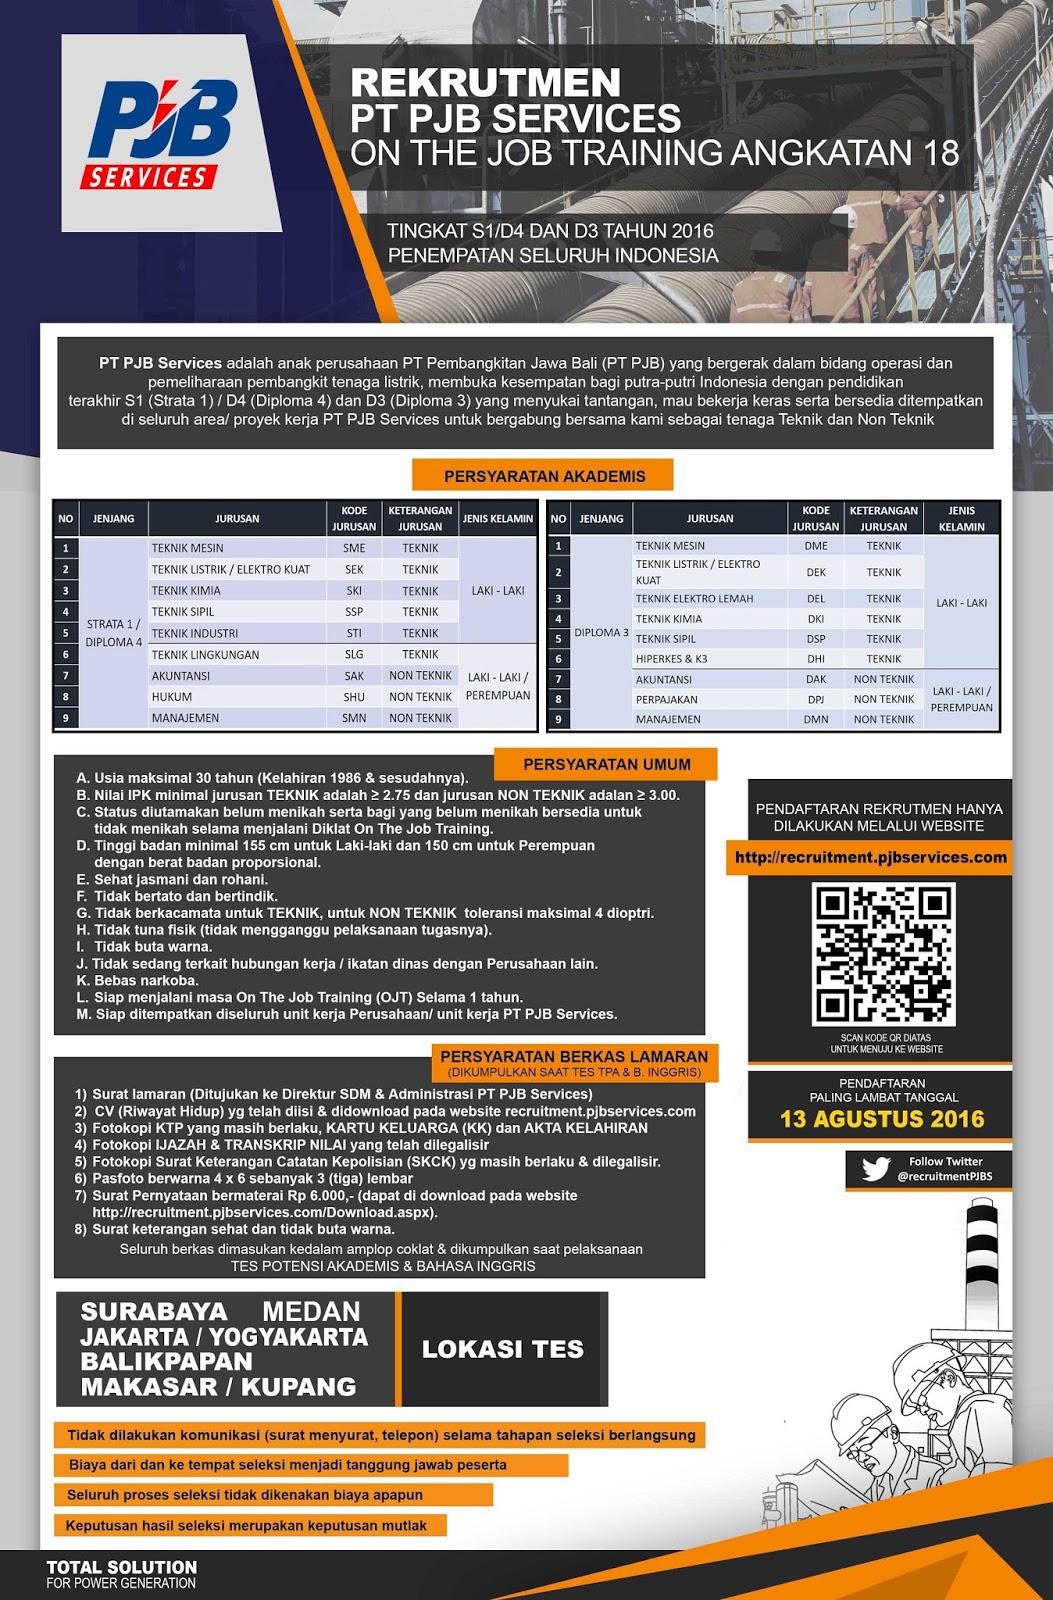 http://www.rekrutmen.net/2016/07/Lowongan-kerja-pjb-services-agustus-2016.html